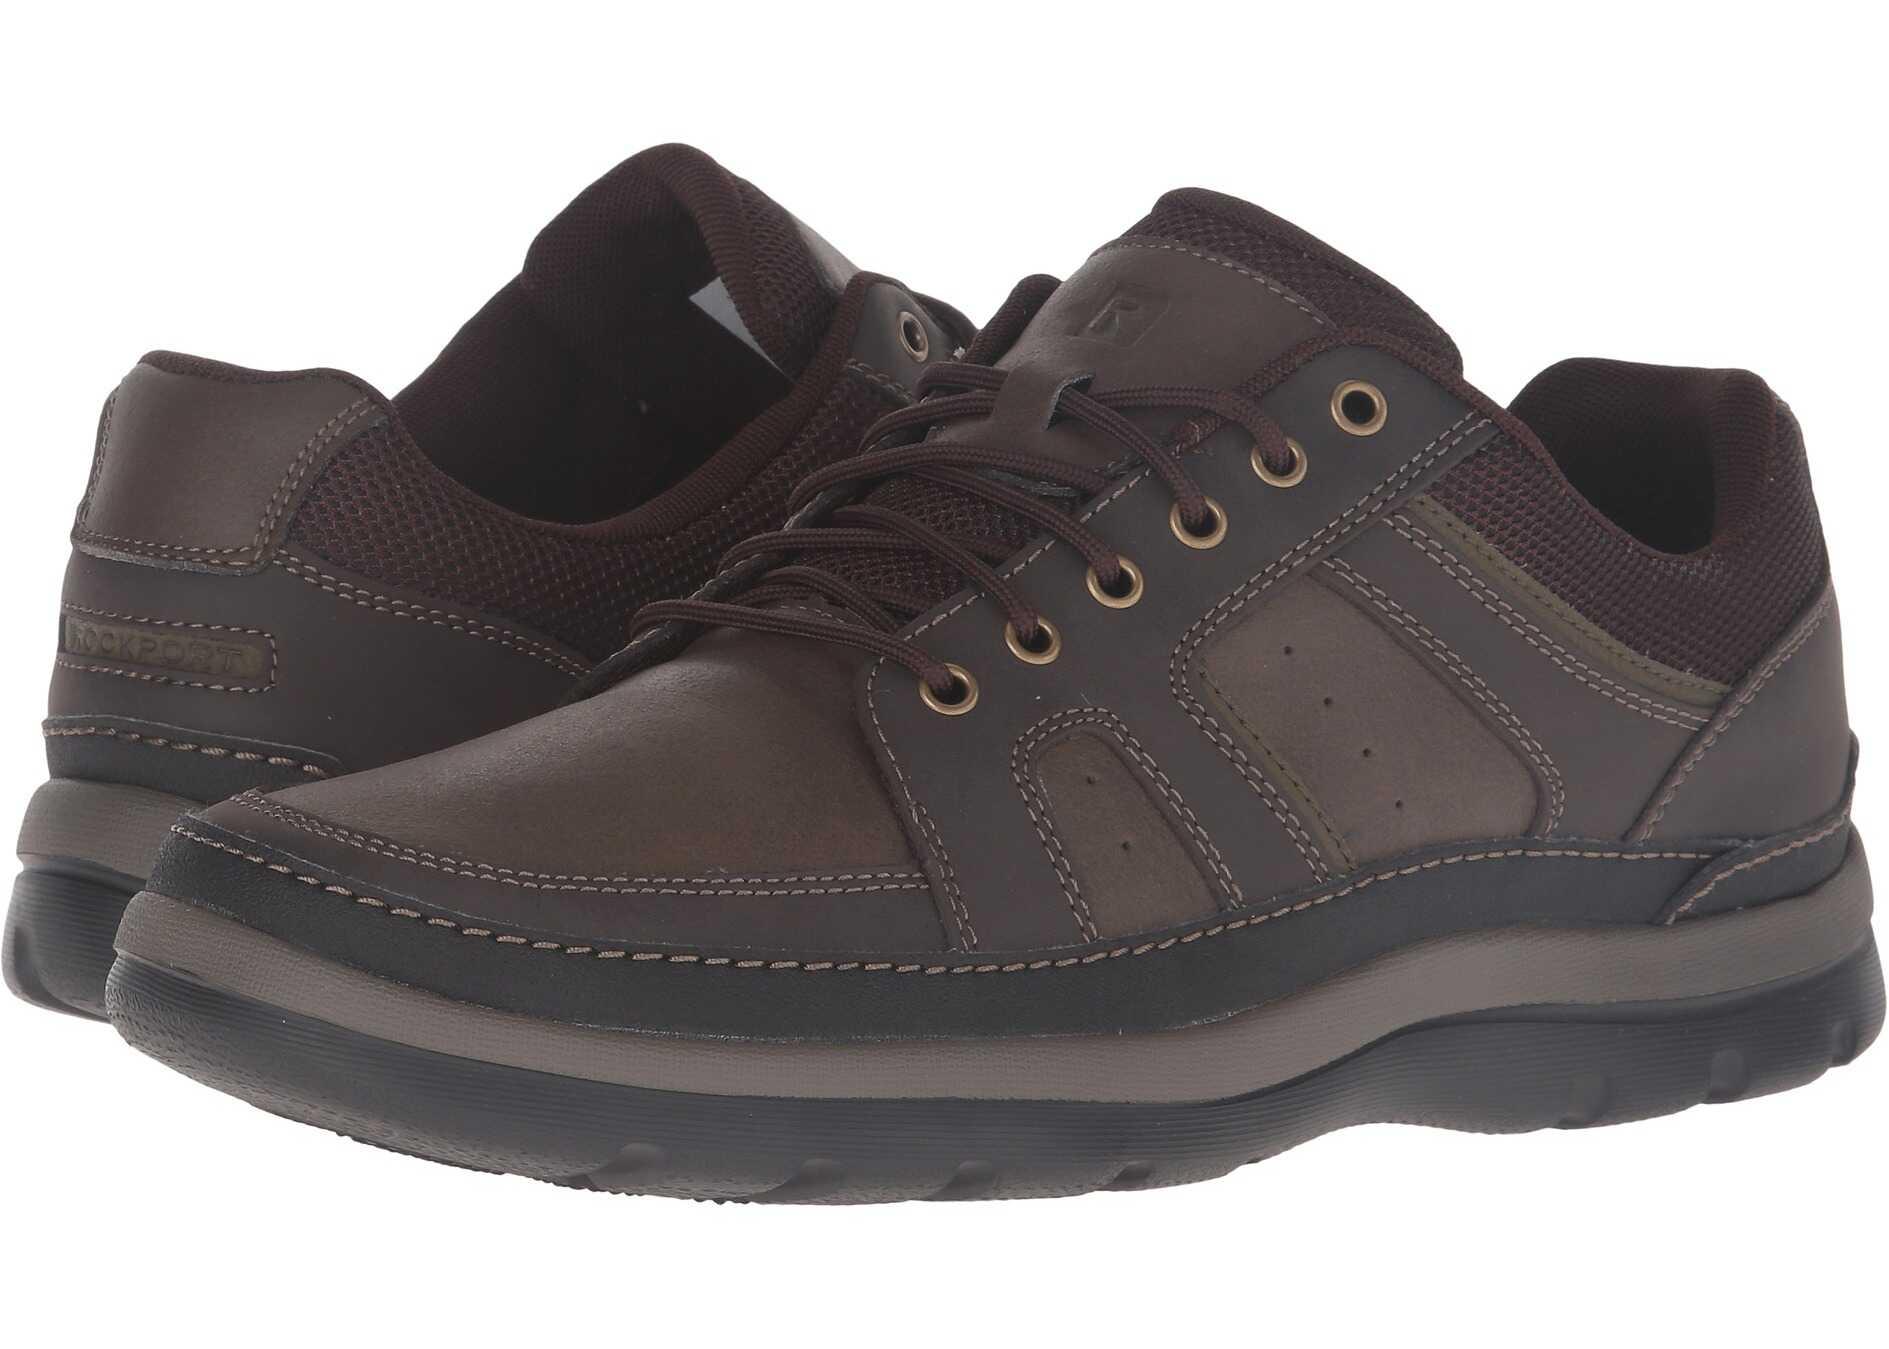 Rockport Get Your Kicks Mudguard Dark Brown Leather